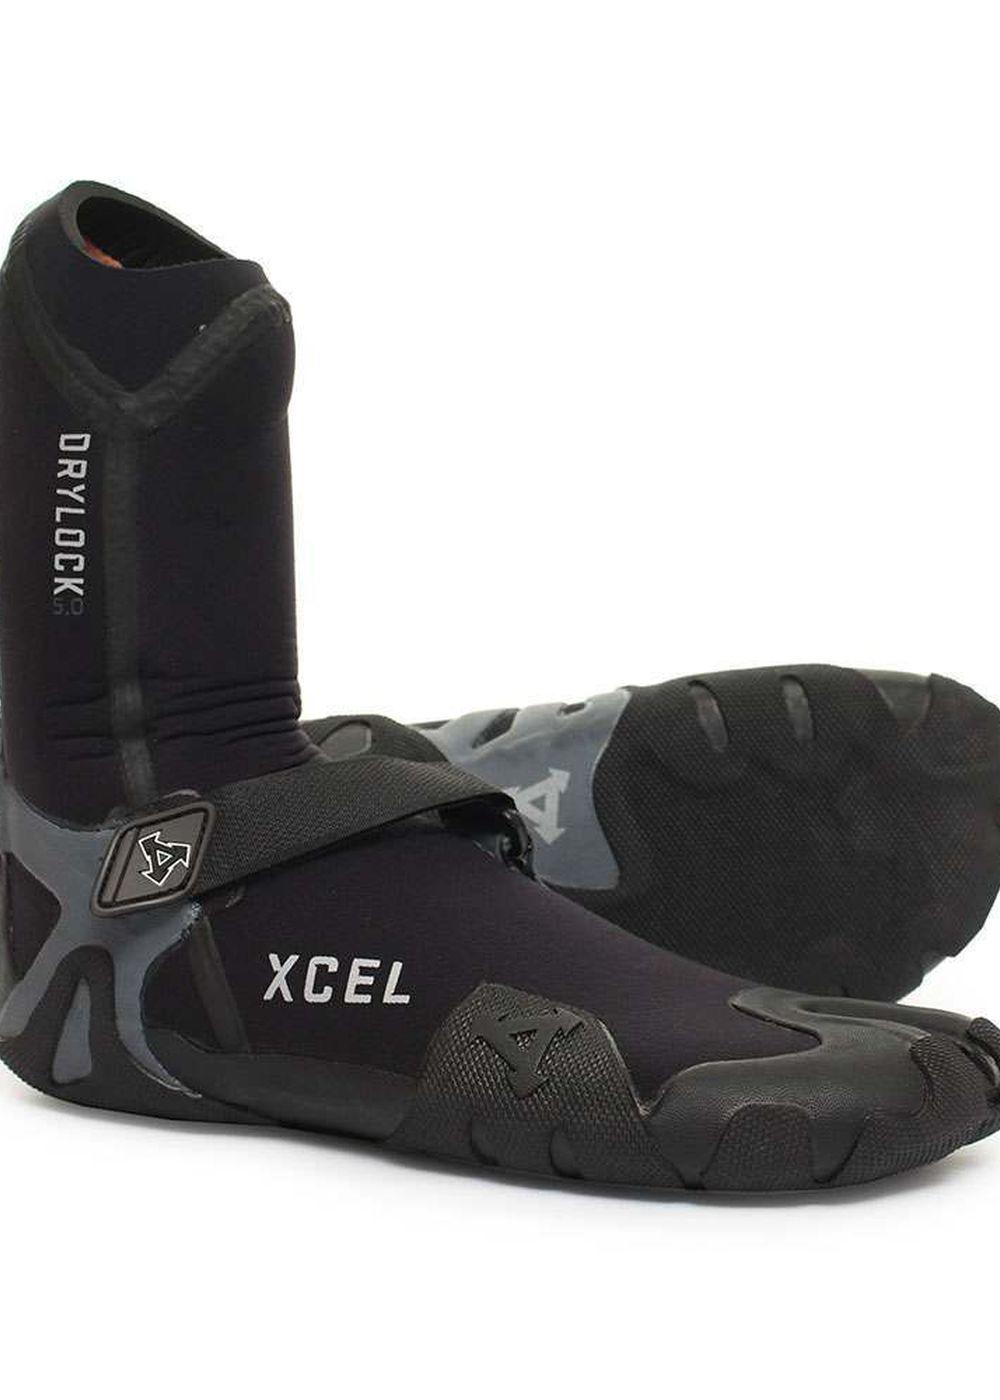 Xcel Drylock 5mm St Celliant Wetsuit Boots Picture